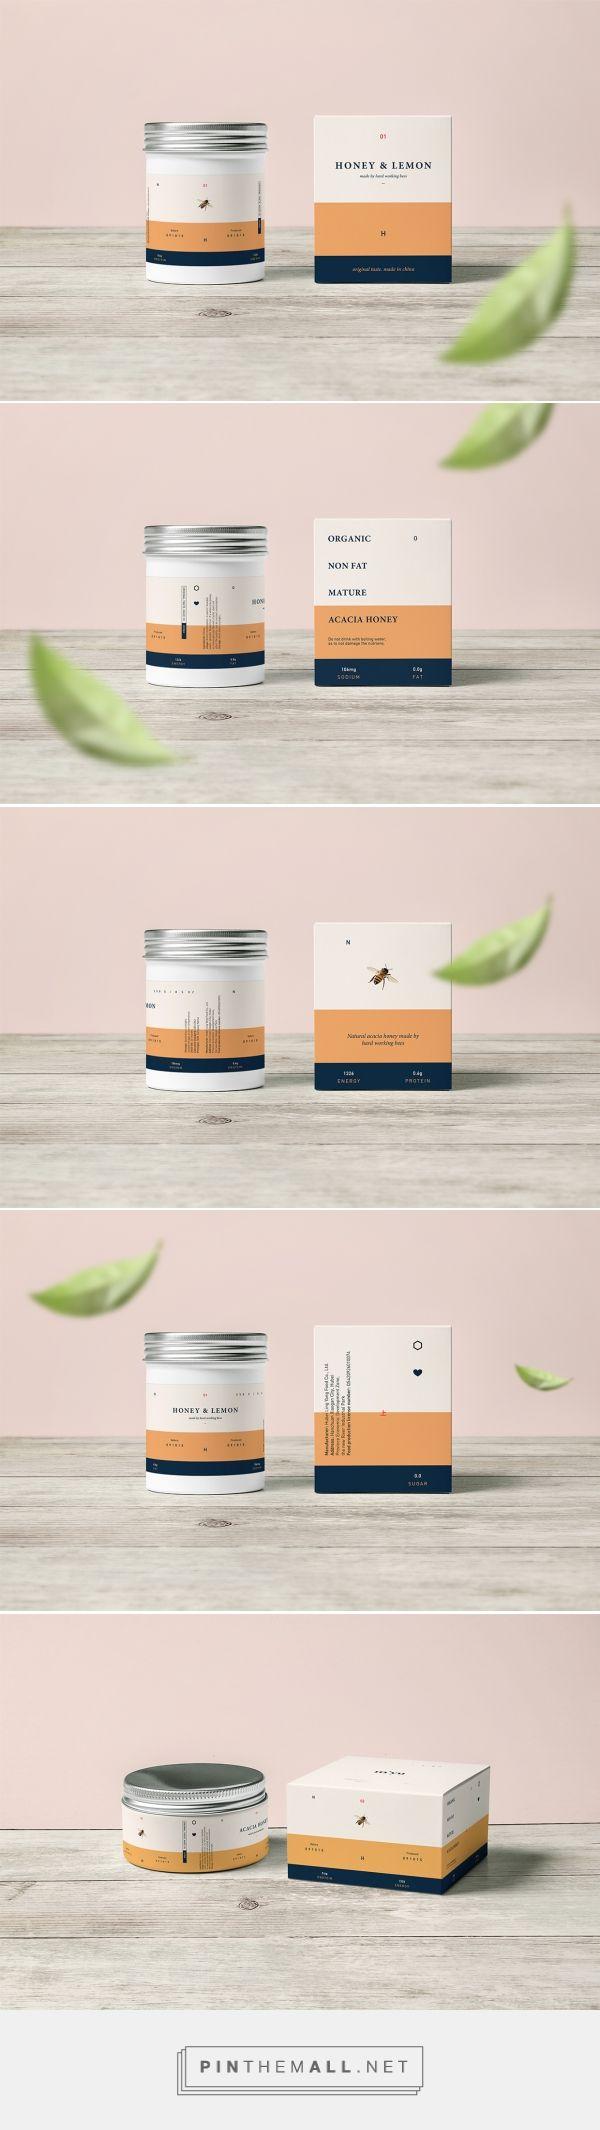 Myiu Tea Packaging Design